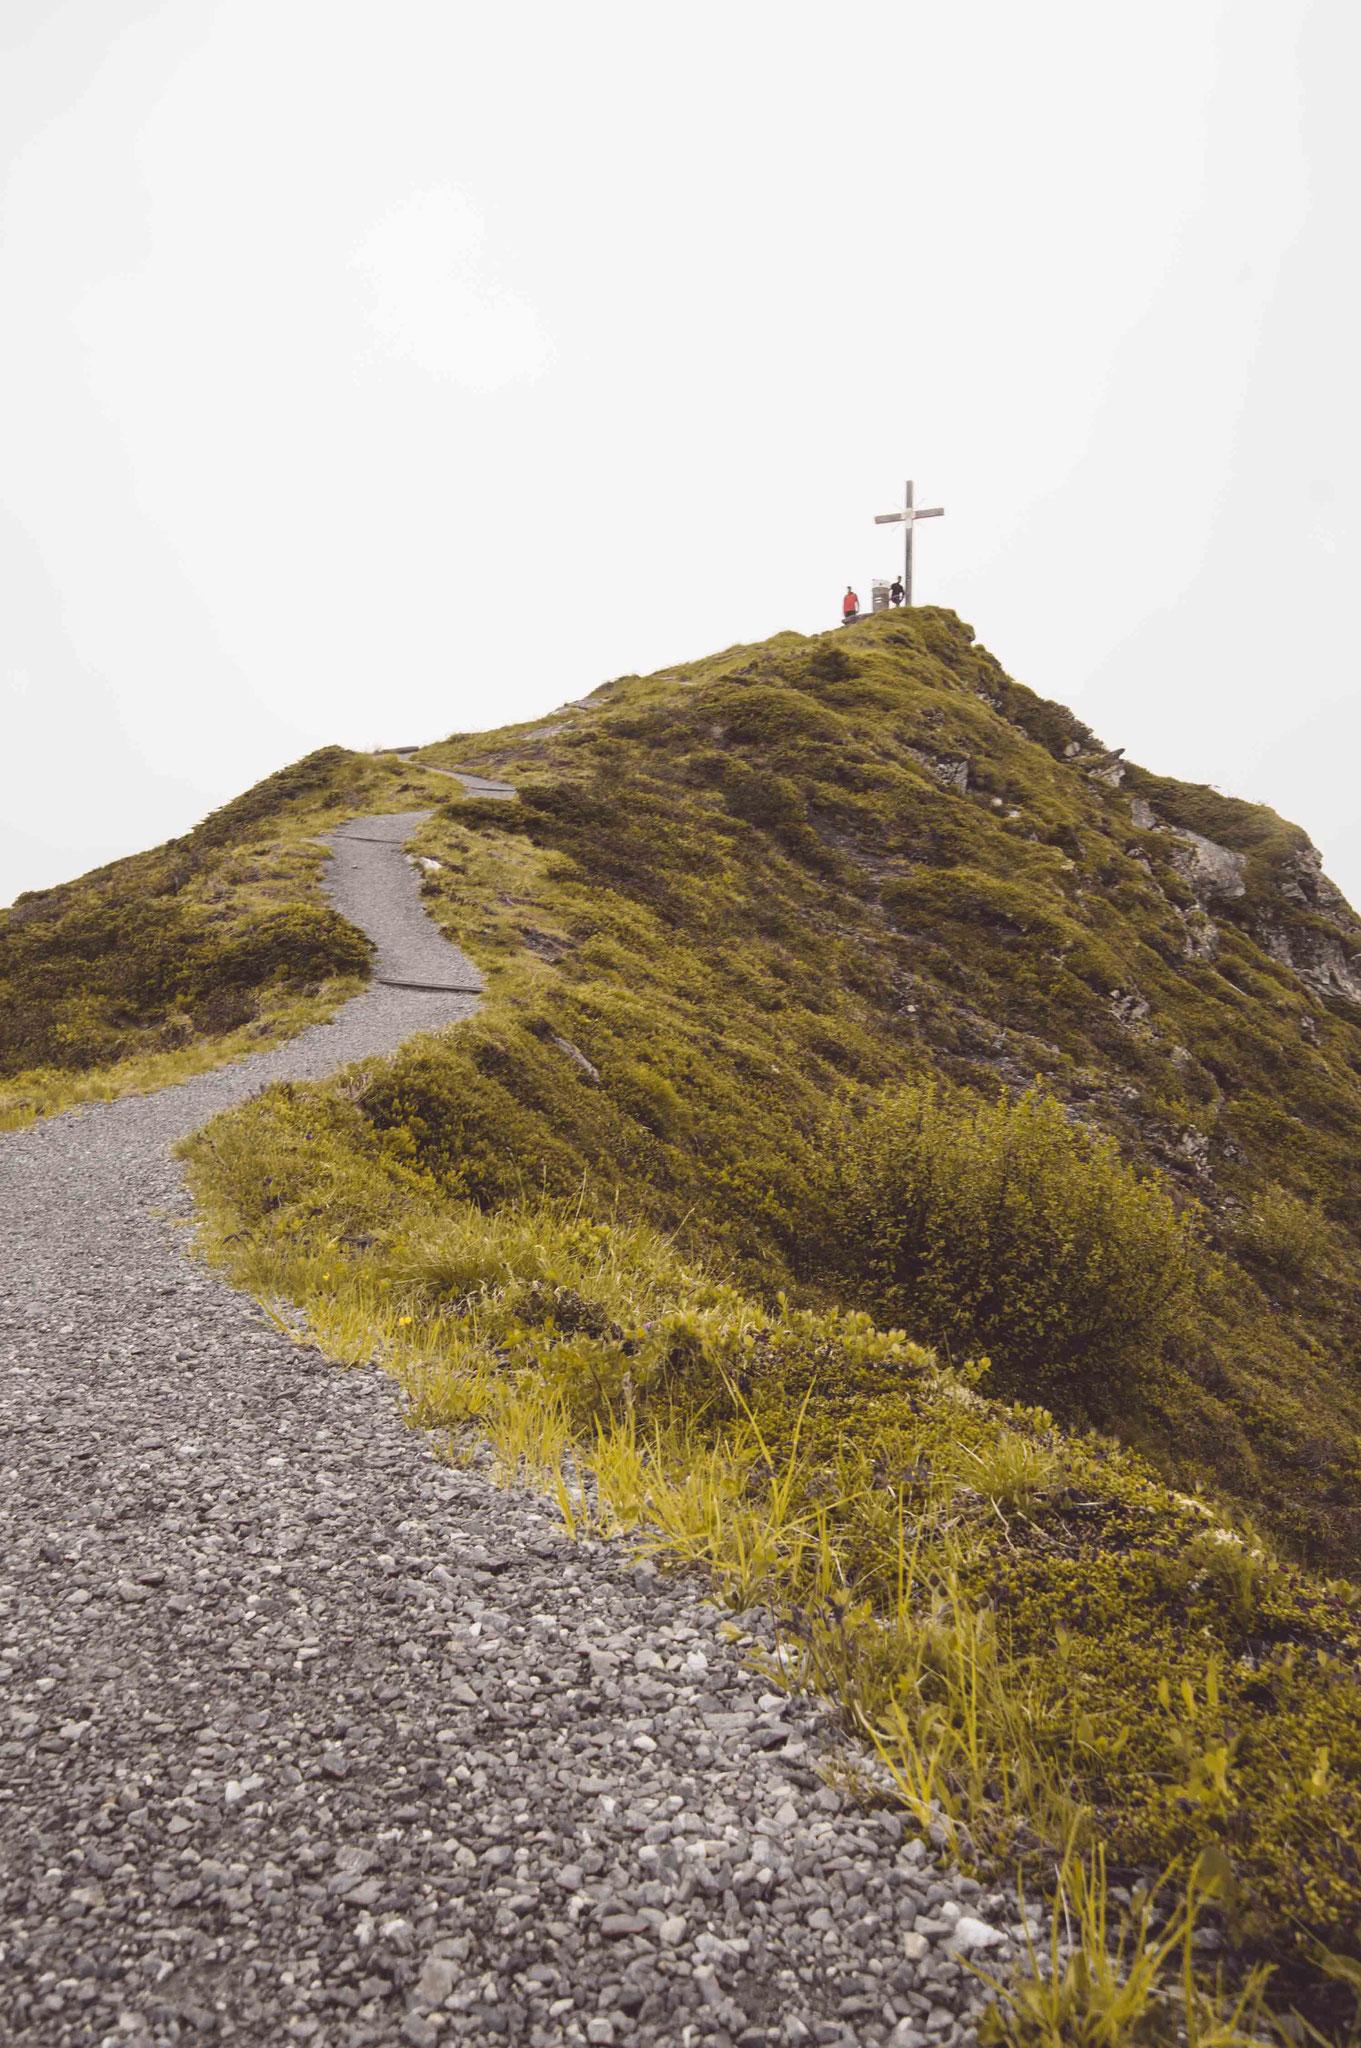 Der Weg zum Gipfel; Golm Montafon